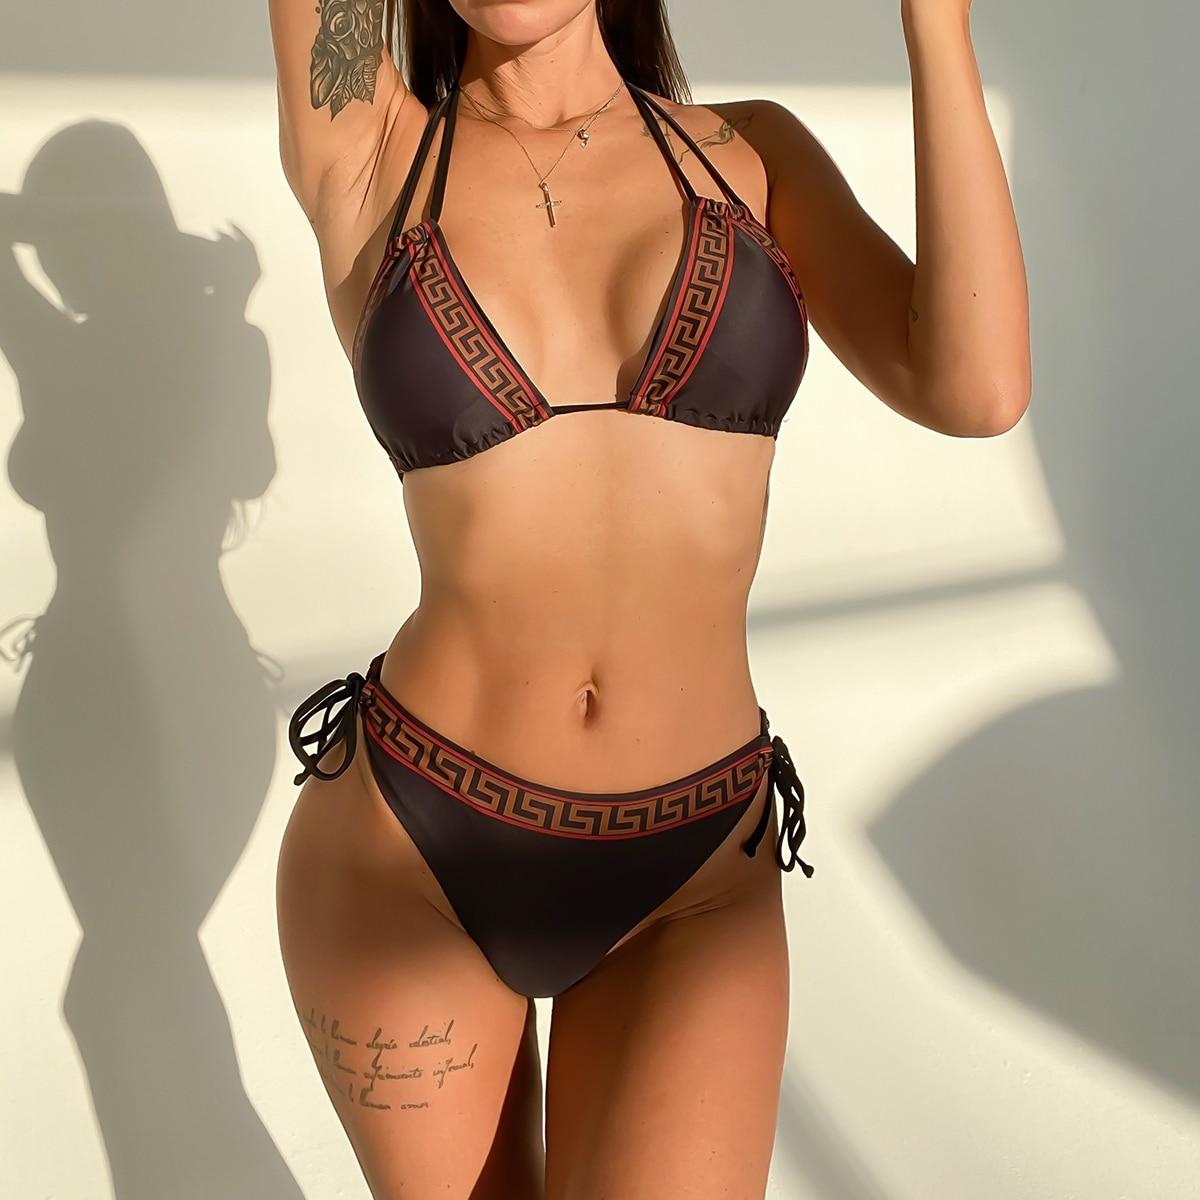 DJC312701-Women Sexy Bikini High Waist Swimsuit